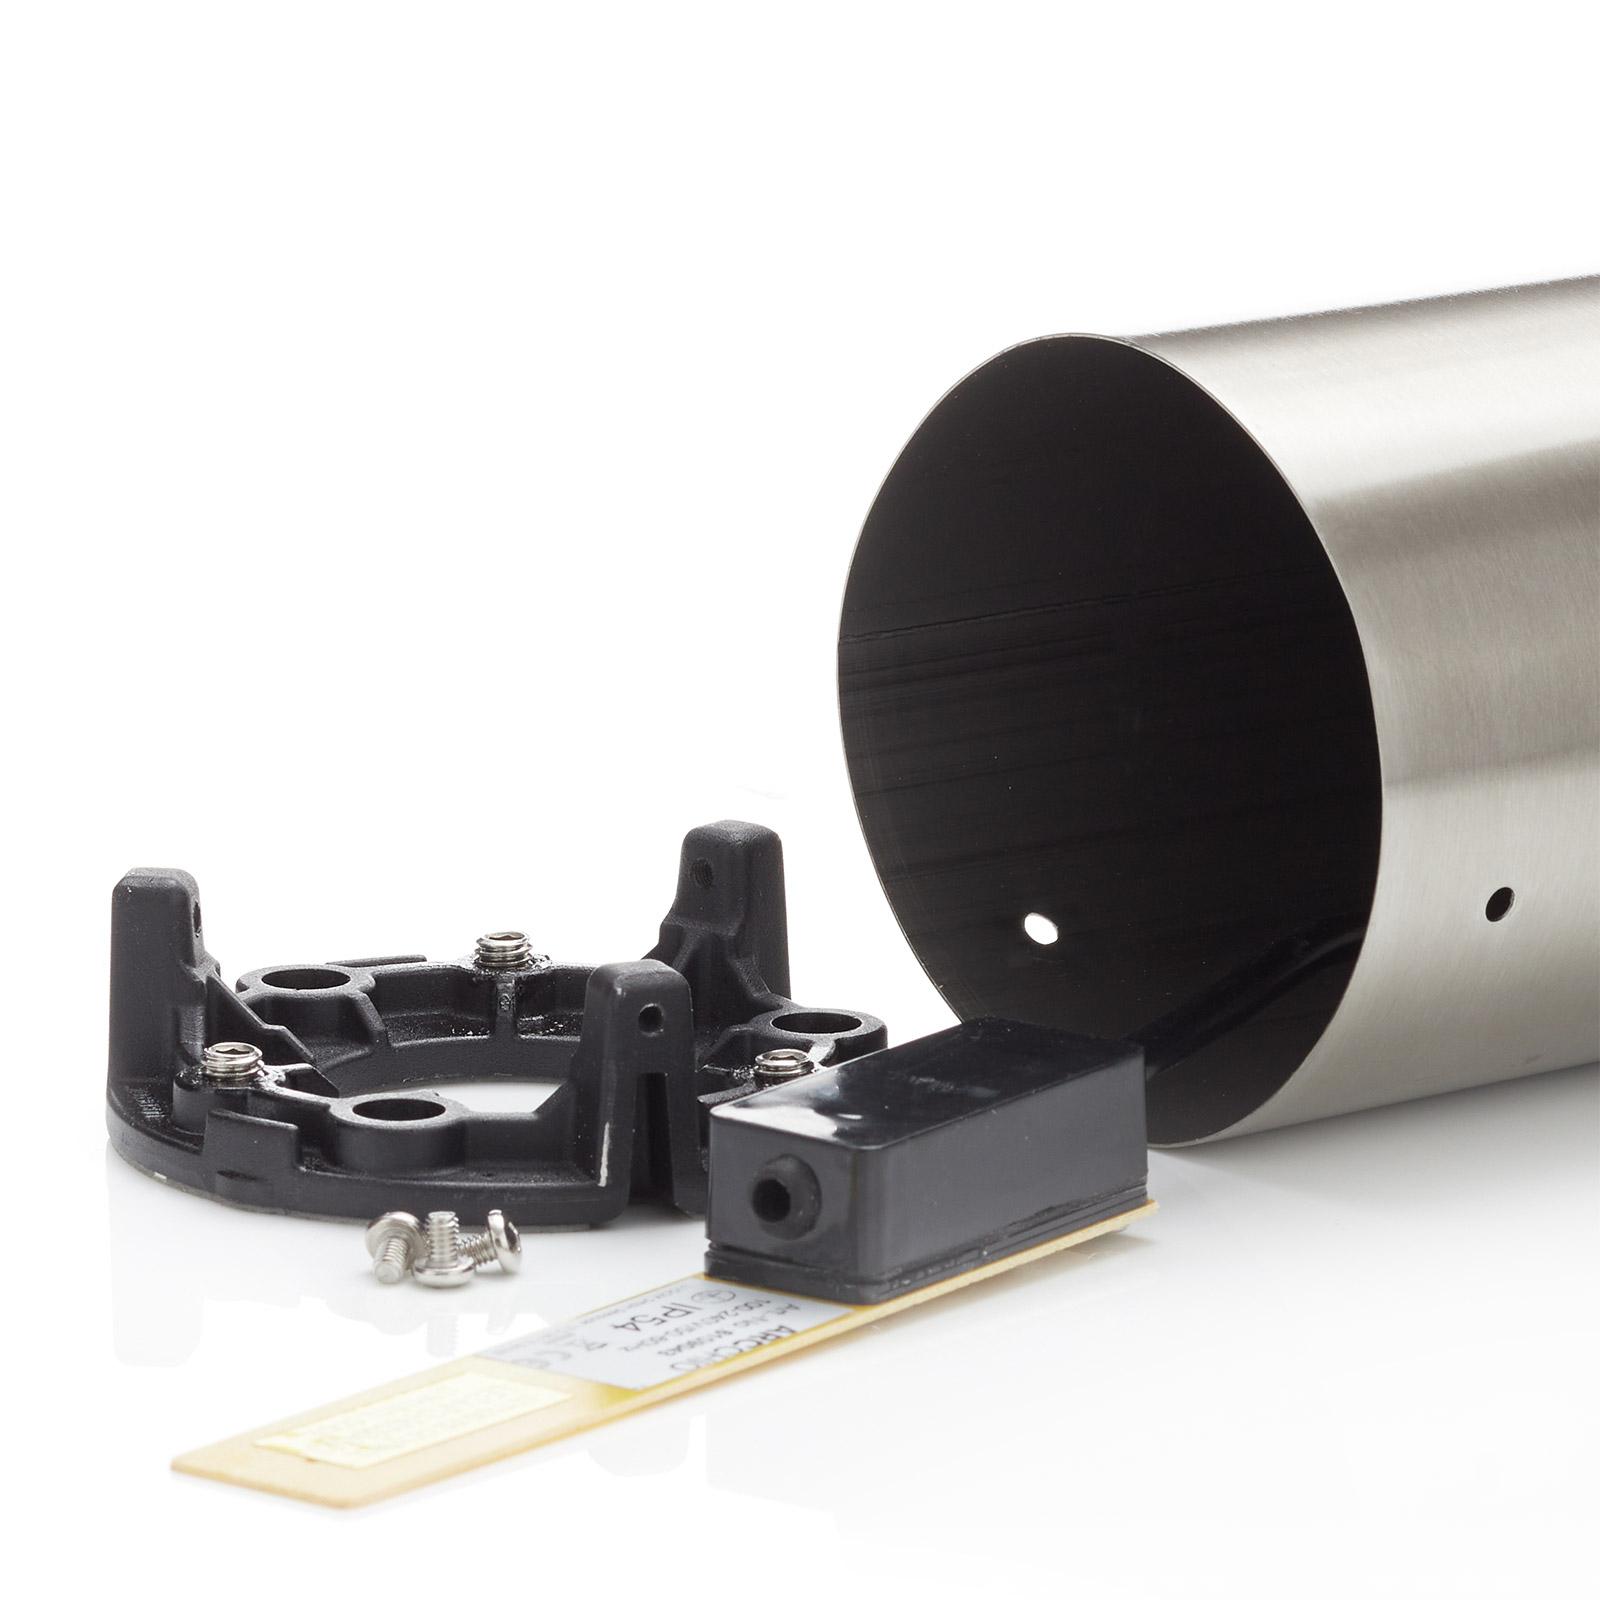 Arcchio Lica baliza de acero inoxidable, 50 cm